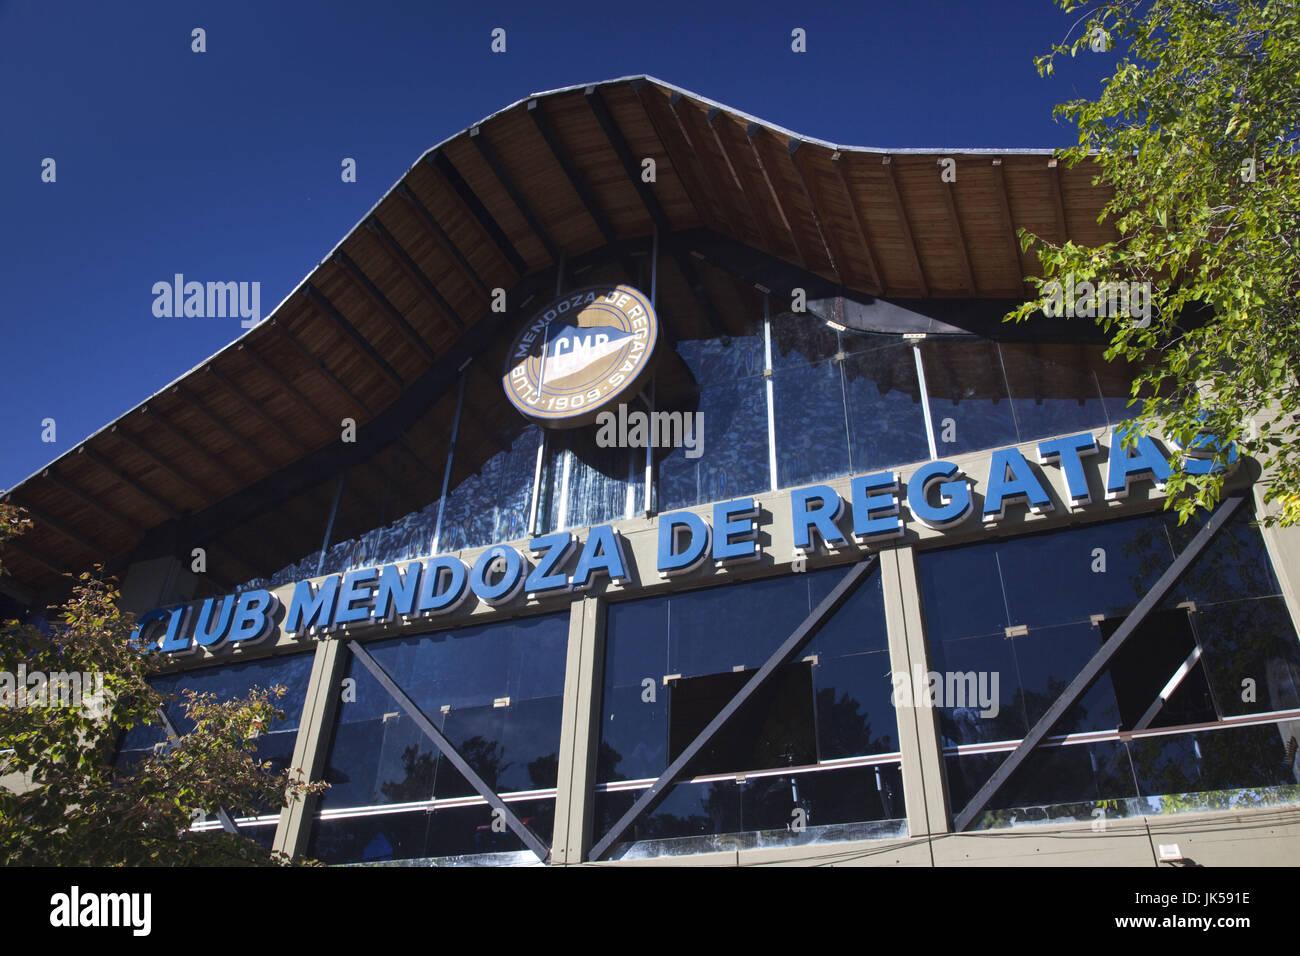 Argentina, Mendoza Province, Mendoza, Parque San Martin, Club Mendoza de Regata - Stock Image